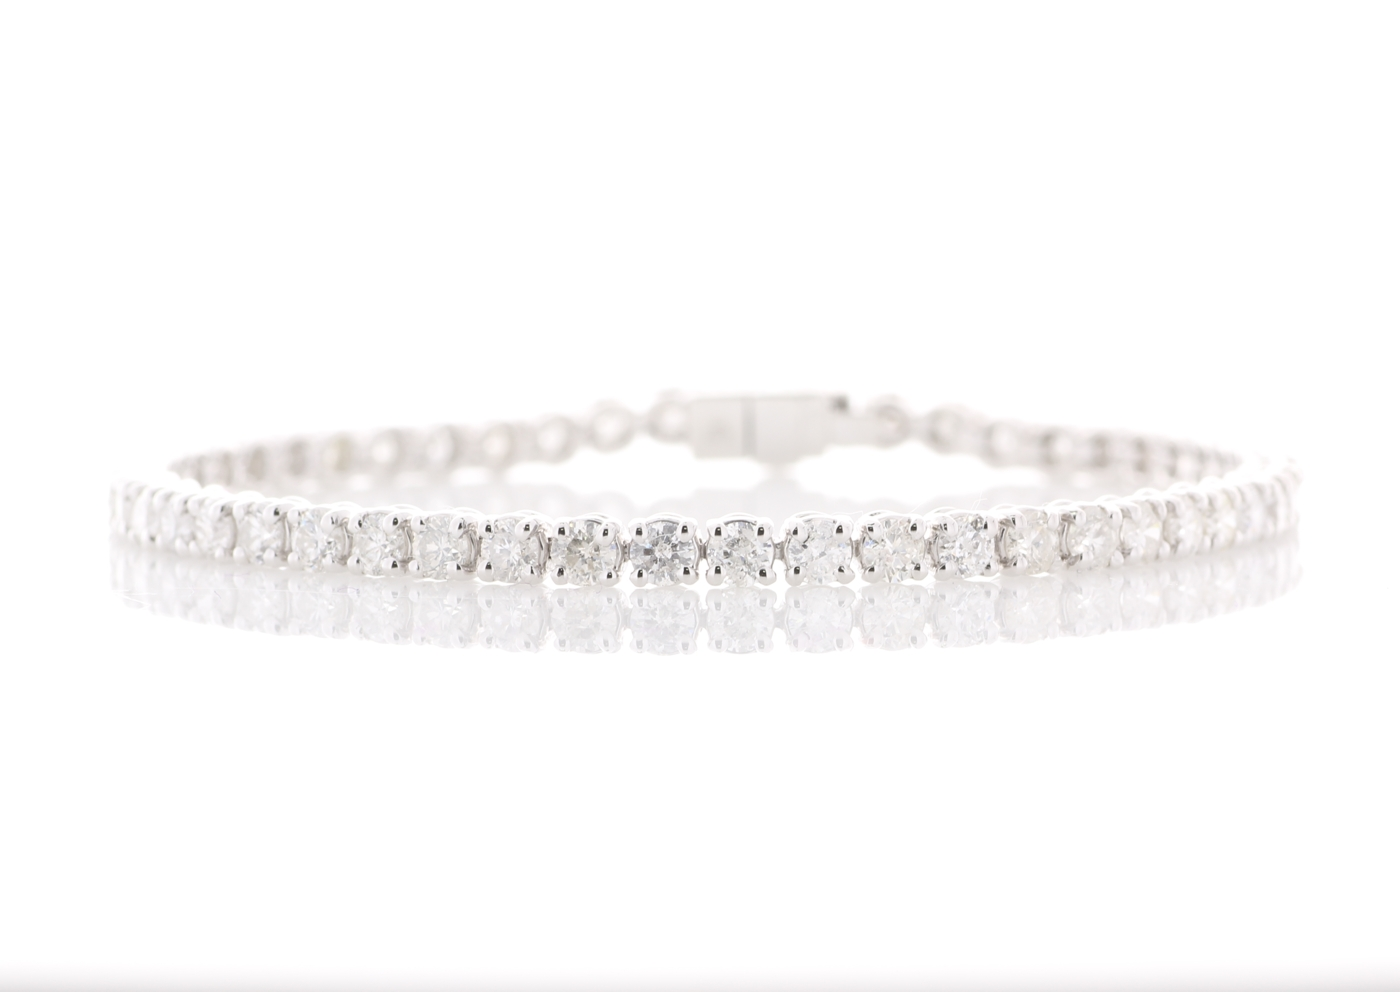 Lot 45 - 18ct White Gold Tennis Diamond Bracelet 5.50 Carats